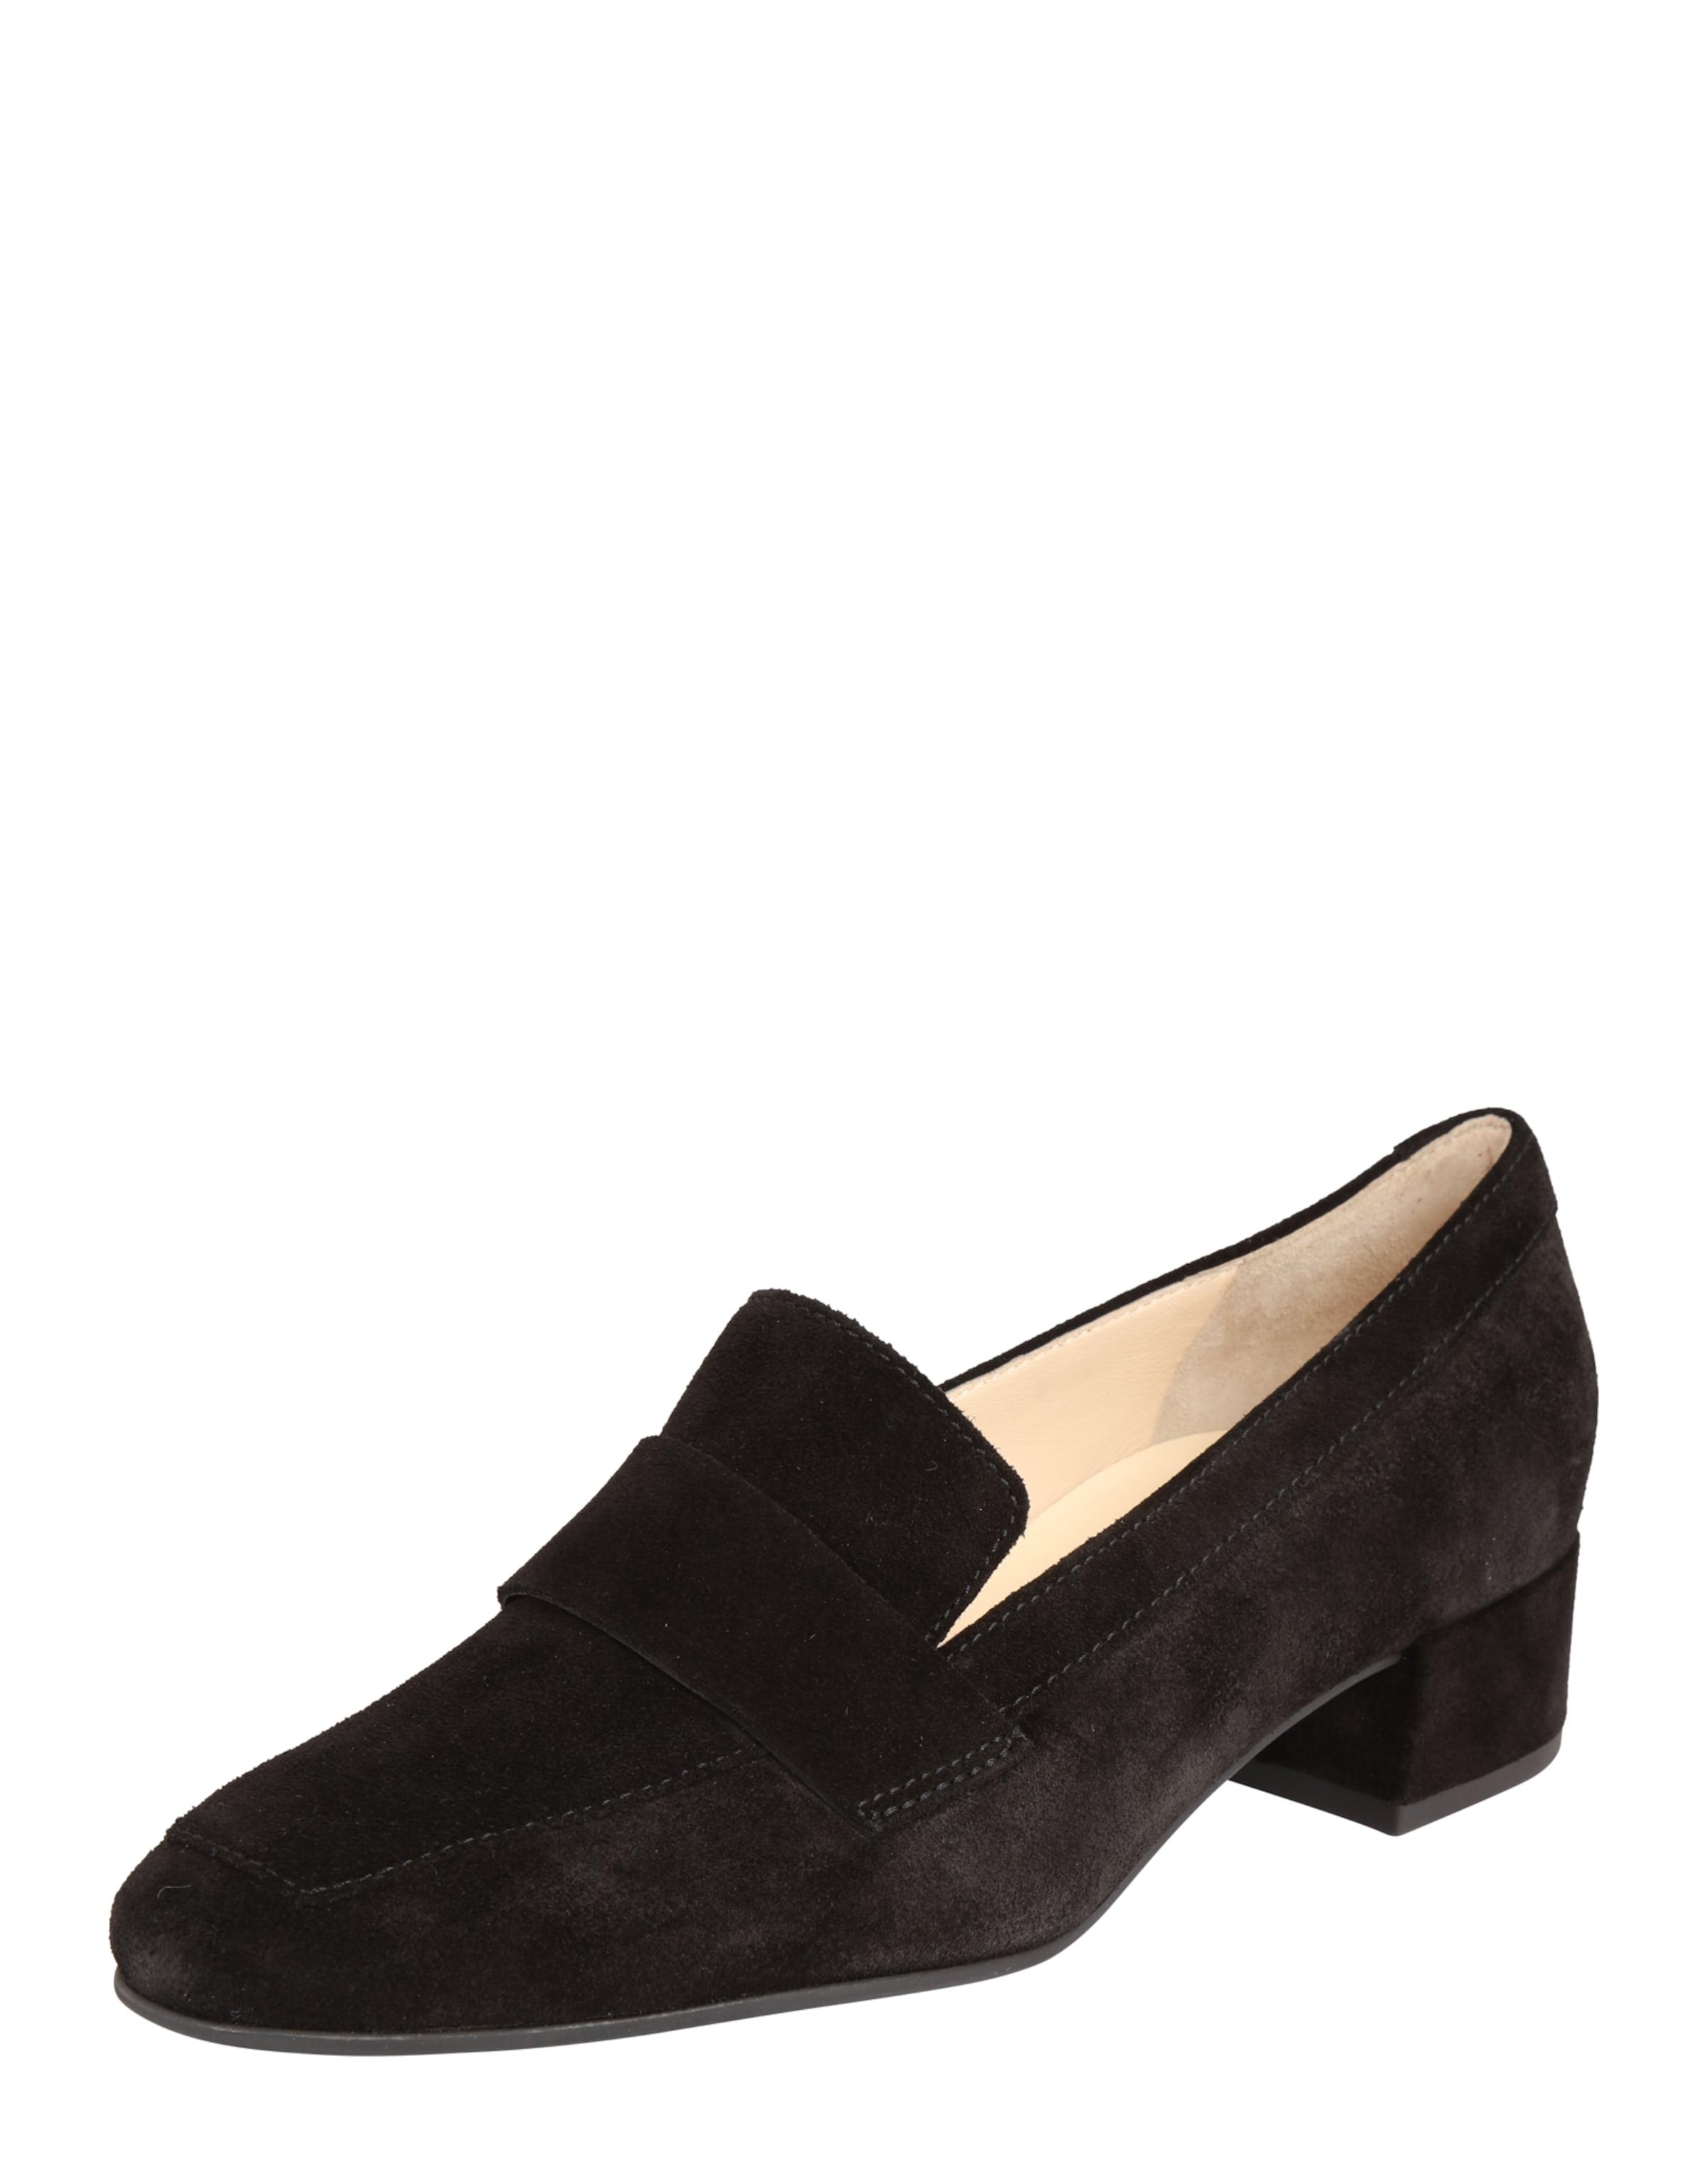 Haltbare Mode billige Schuhe Högl | Slipper 'Penny Loafer' Schuhe Gut getragene Schuhe